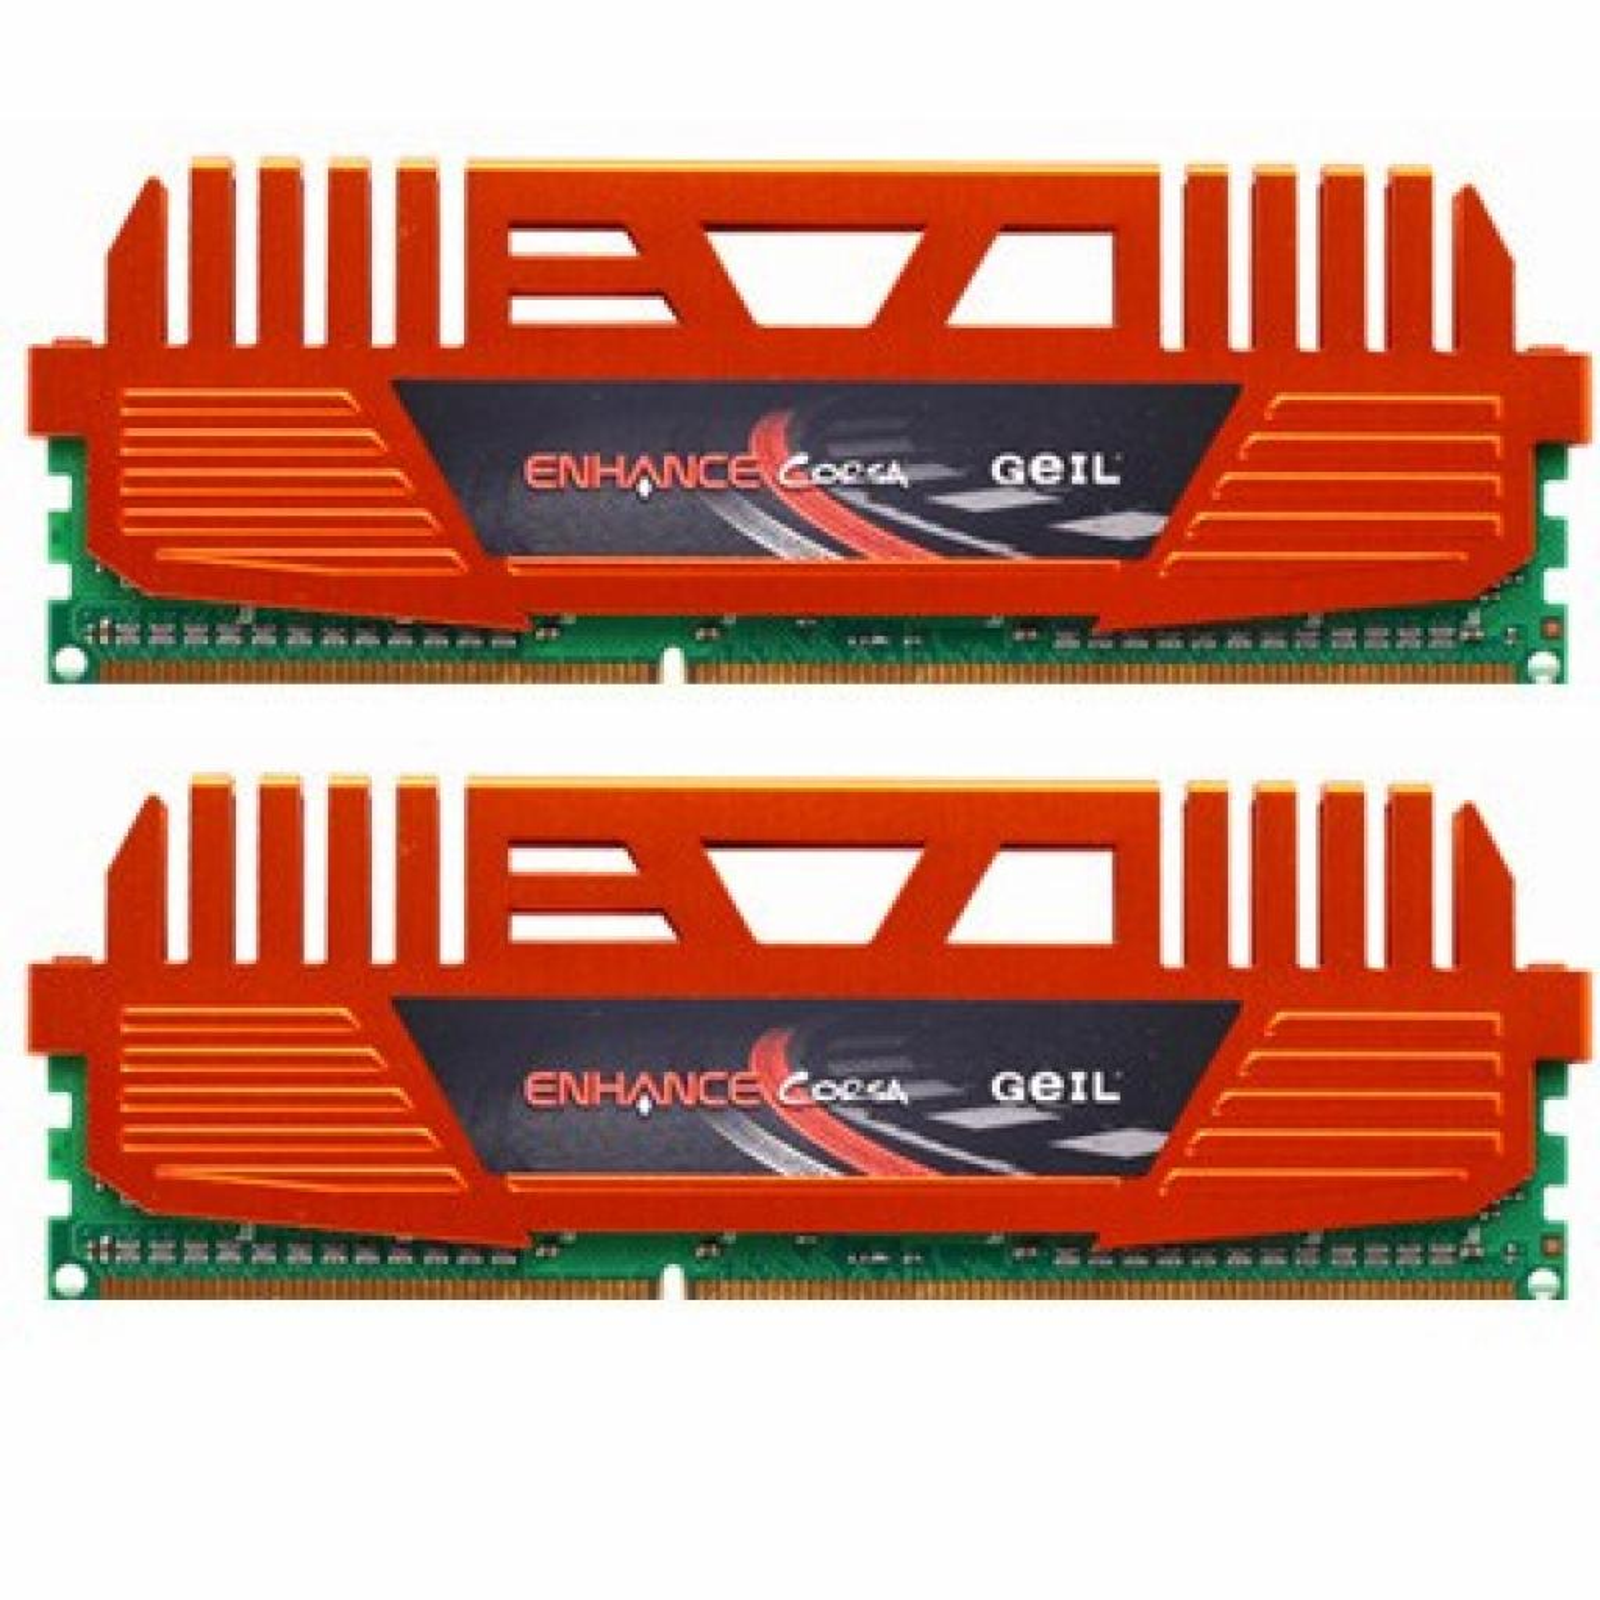 Модуль памяти для компьютера DDR3 8GB (2x4GB) 1600 MHz GEIL (GEC38GB1600C9DC)